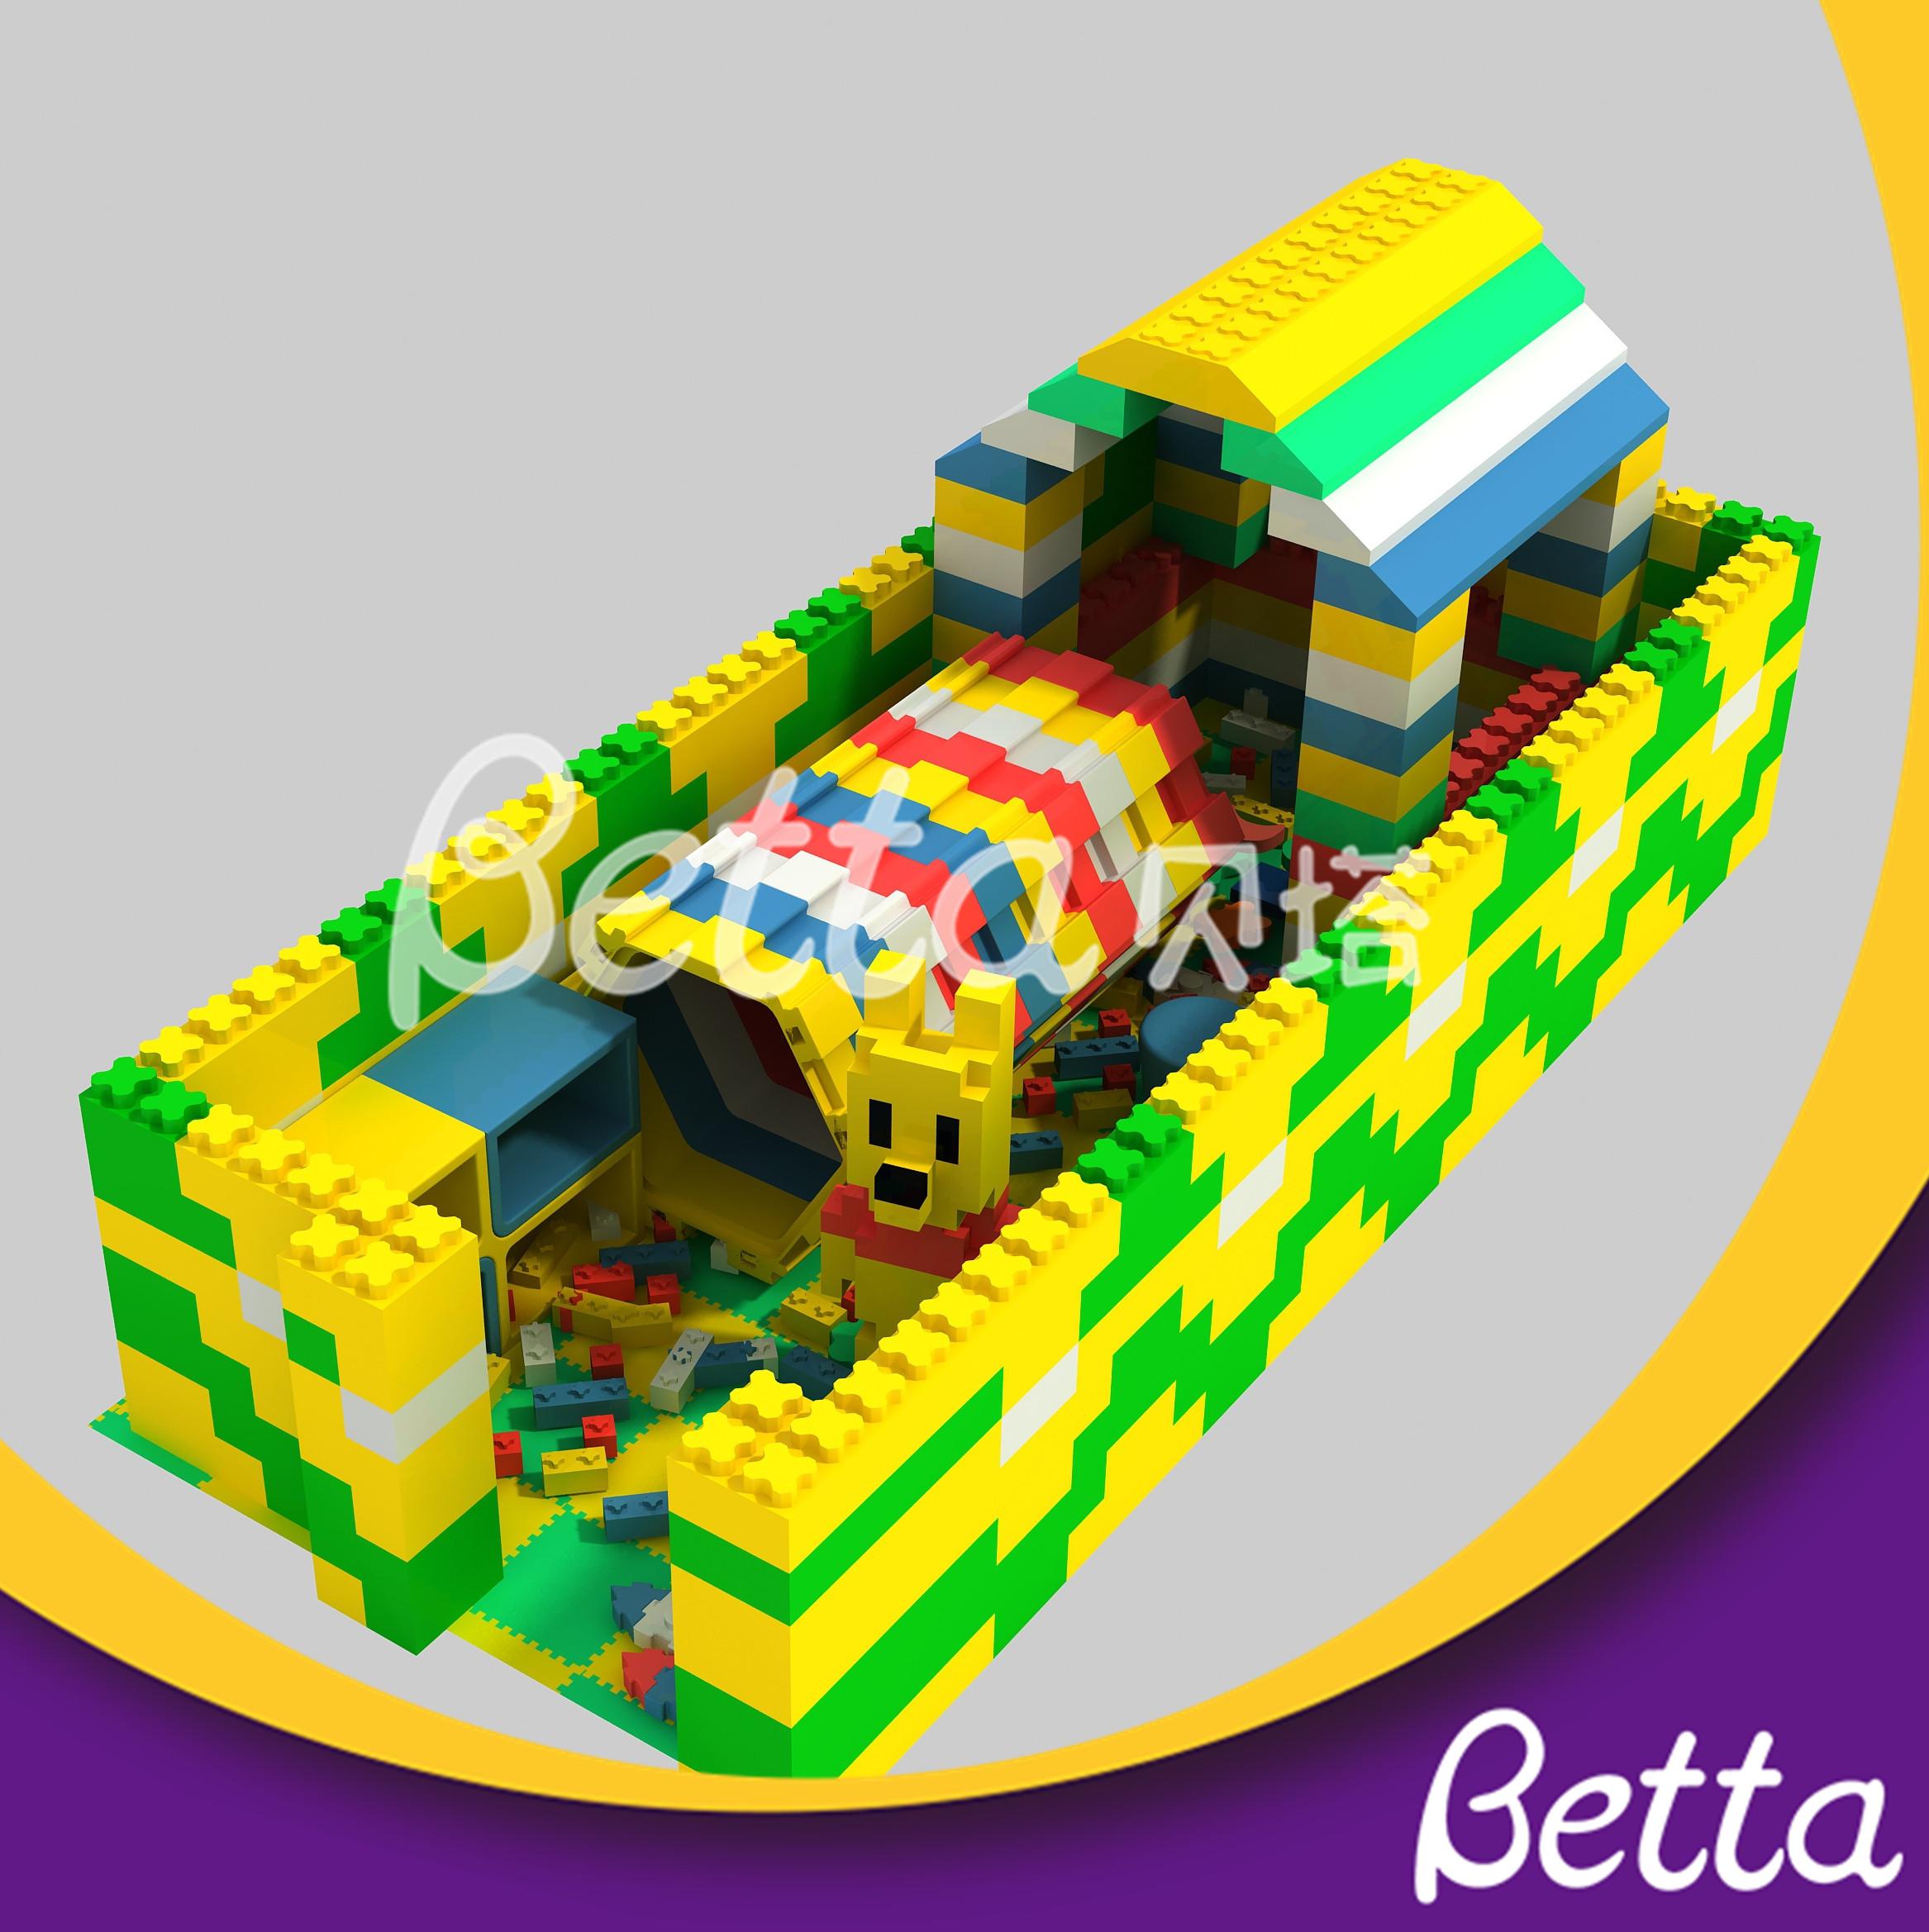 Hot Sale DIY Epp Foam Block Building Educational Toy for